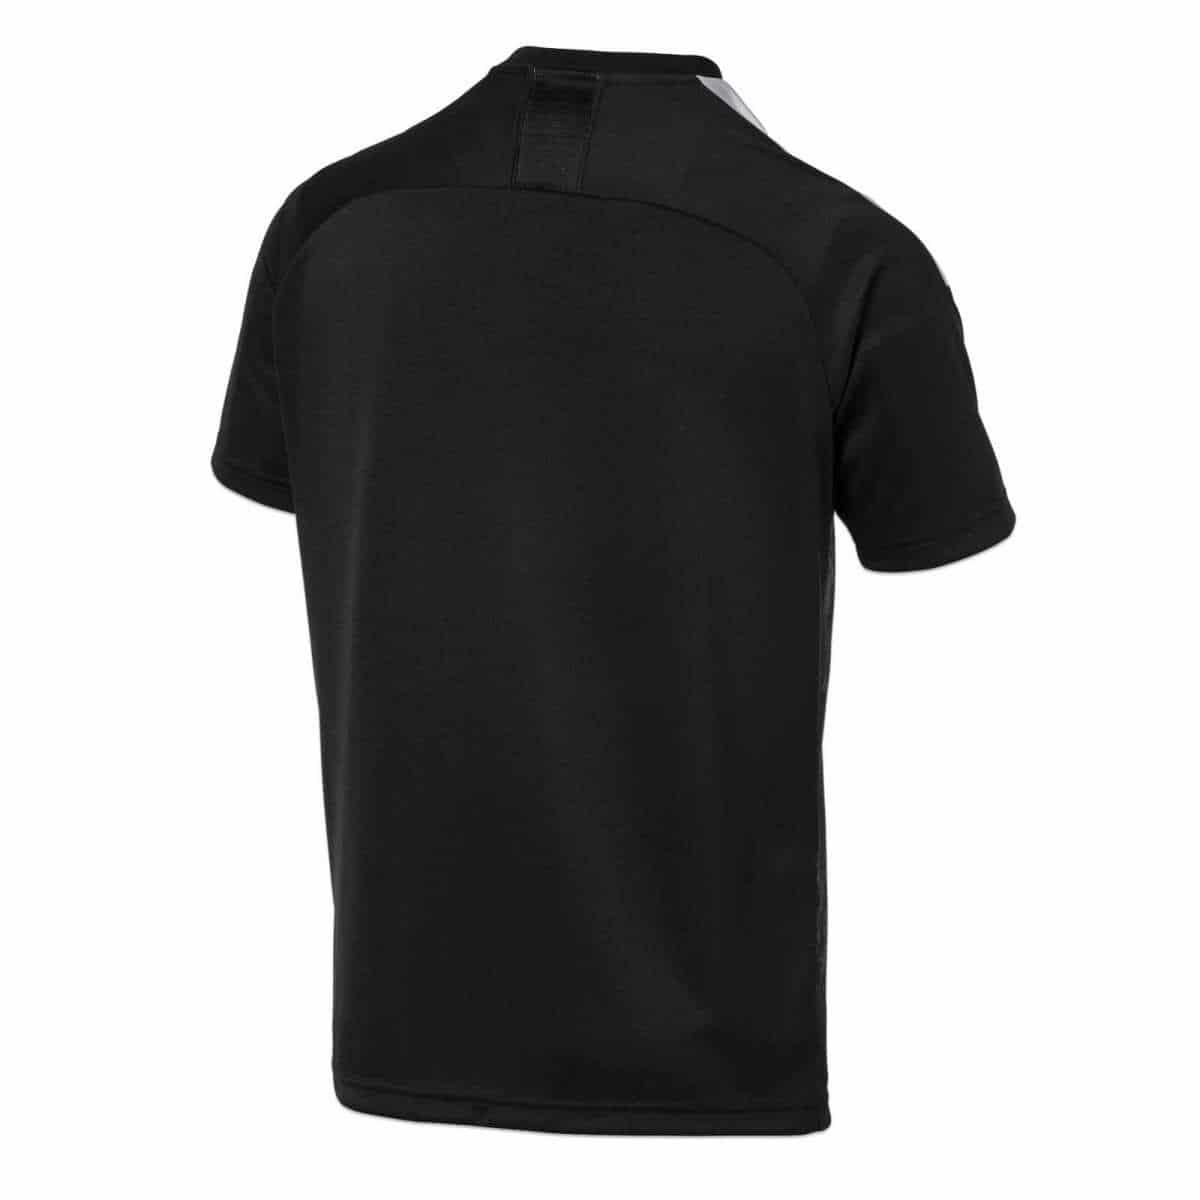 Puma Borussia Dortmund Away Kit 2019 20 The Kitman